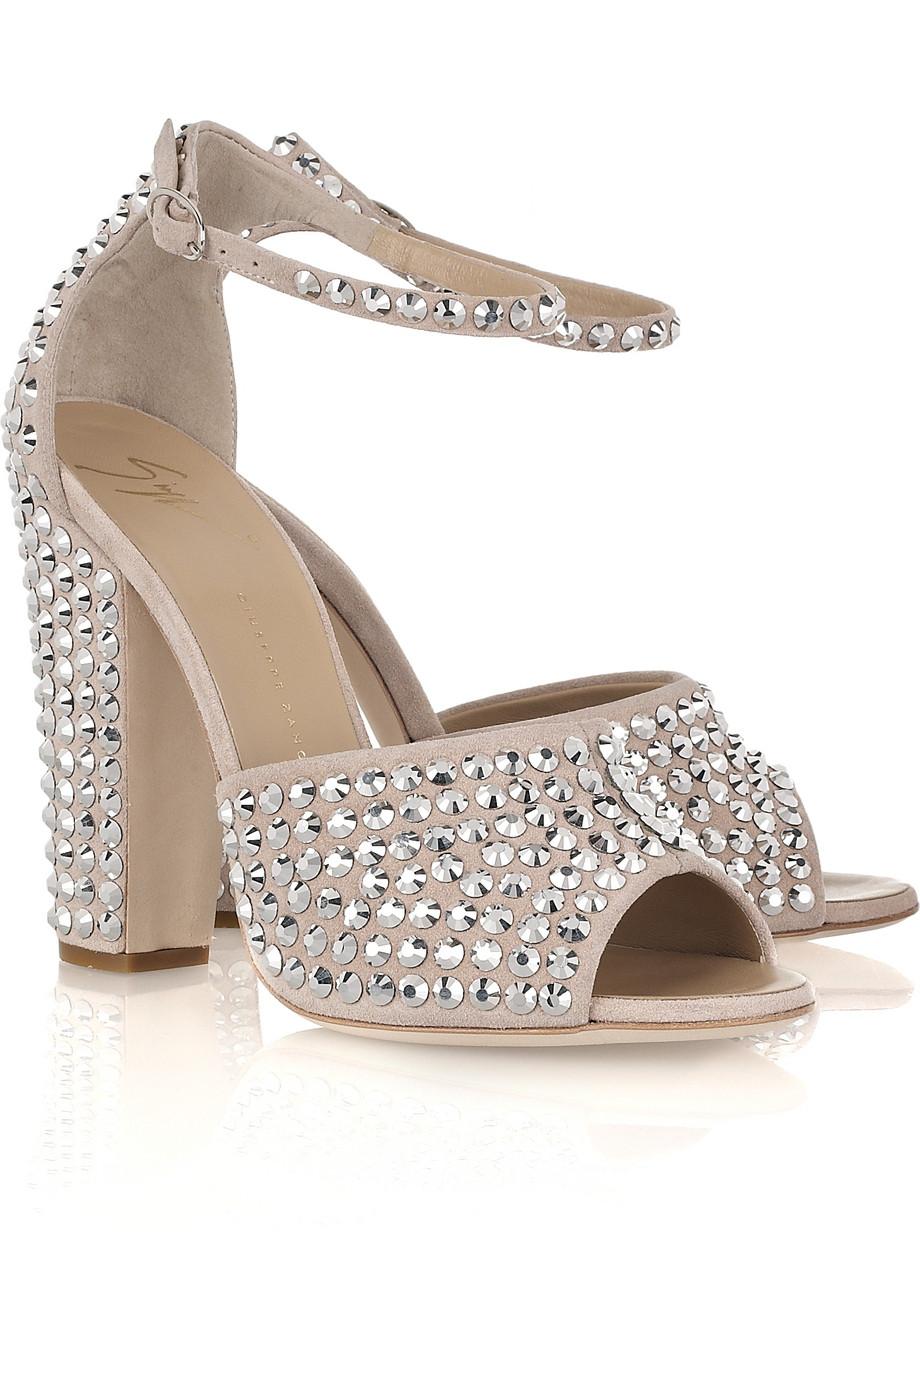 7b9eafbf5 Giuseppe Zanotti Crystal-embellished Suede Sandals in Metallic - Lyst